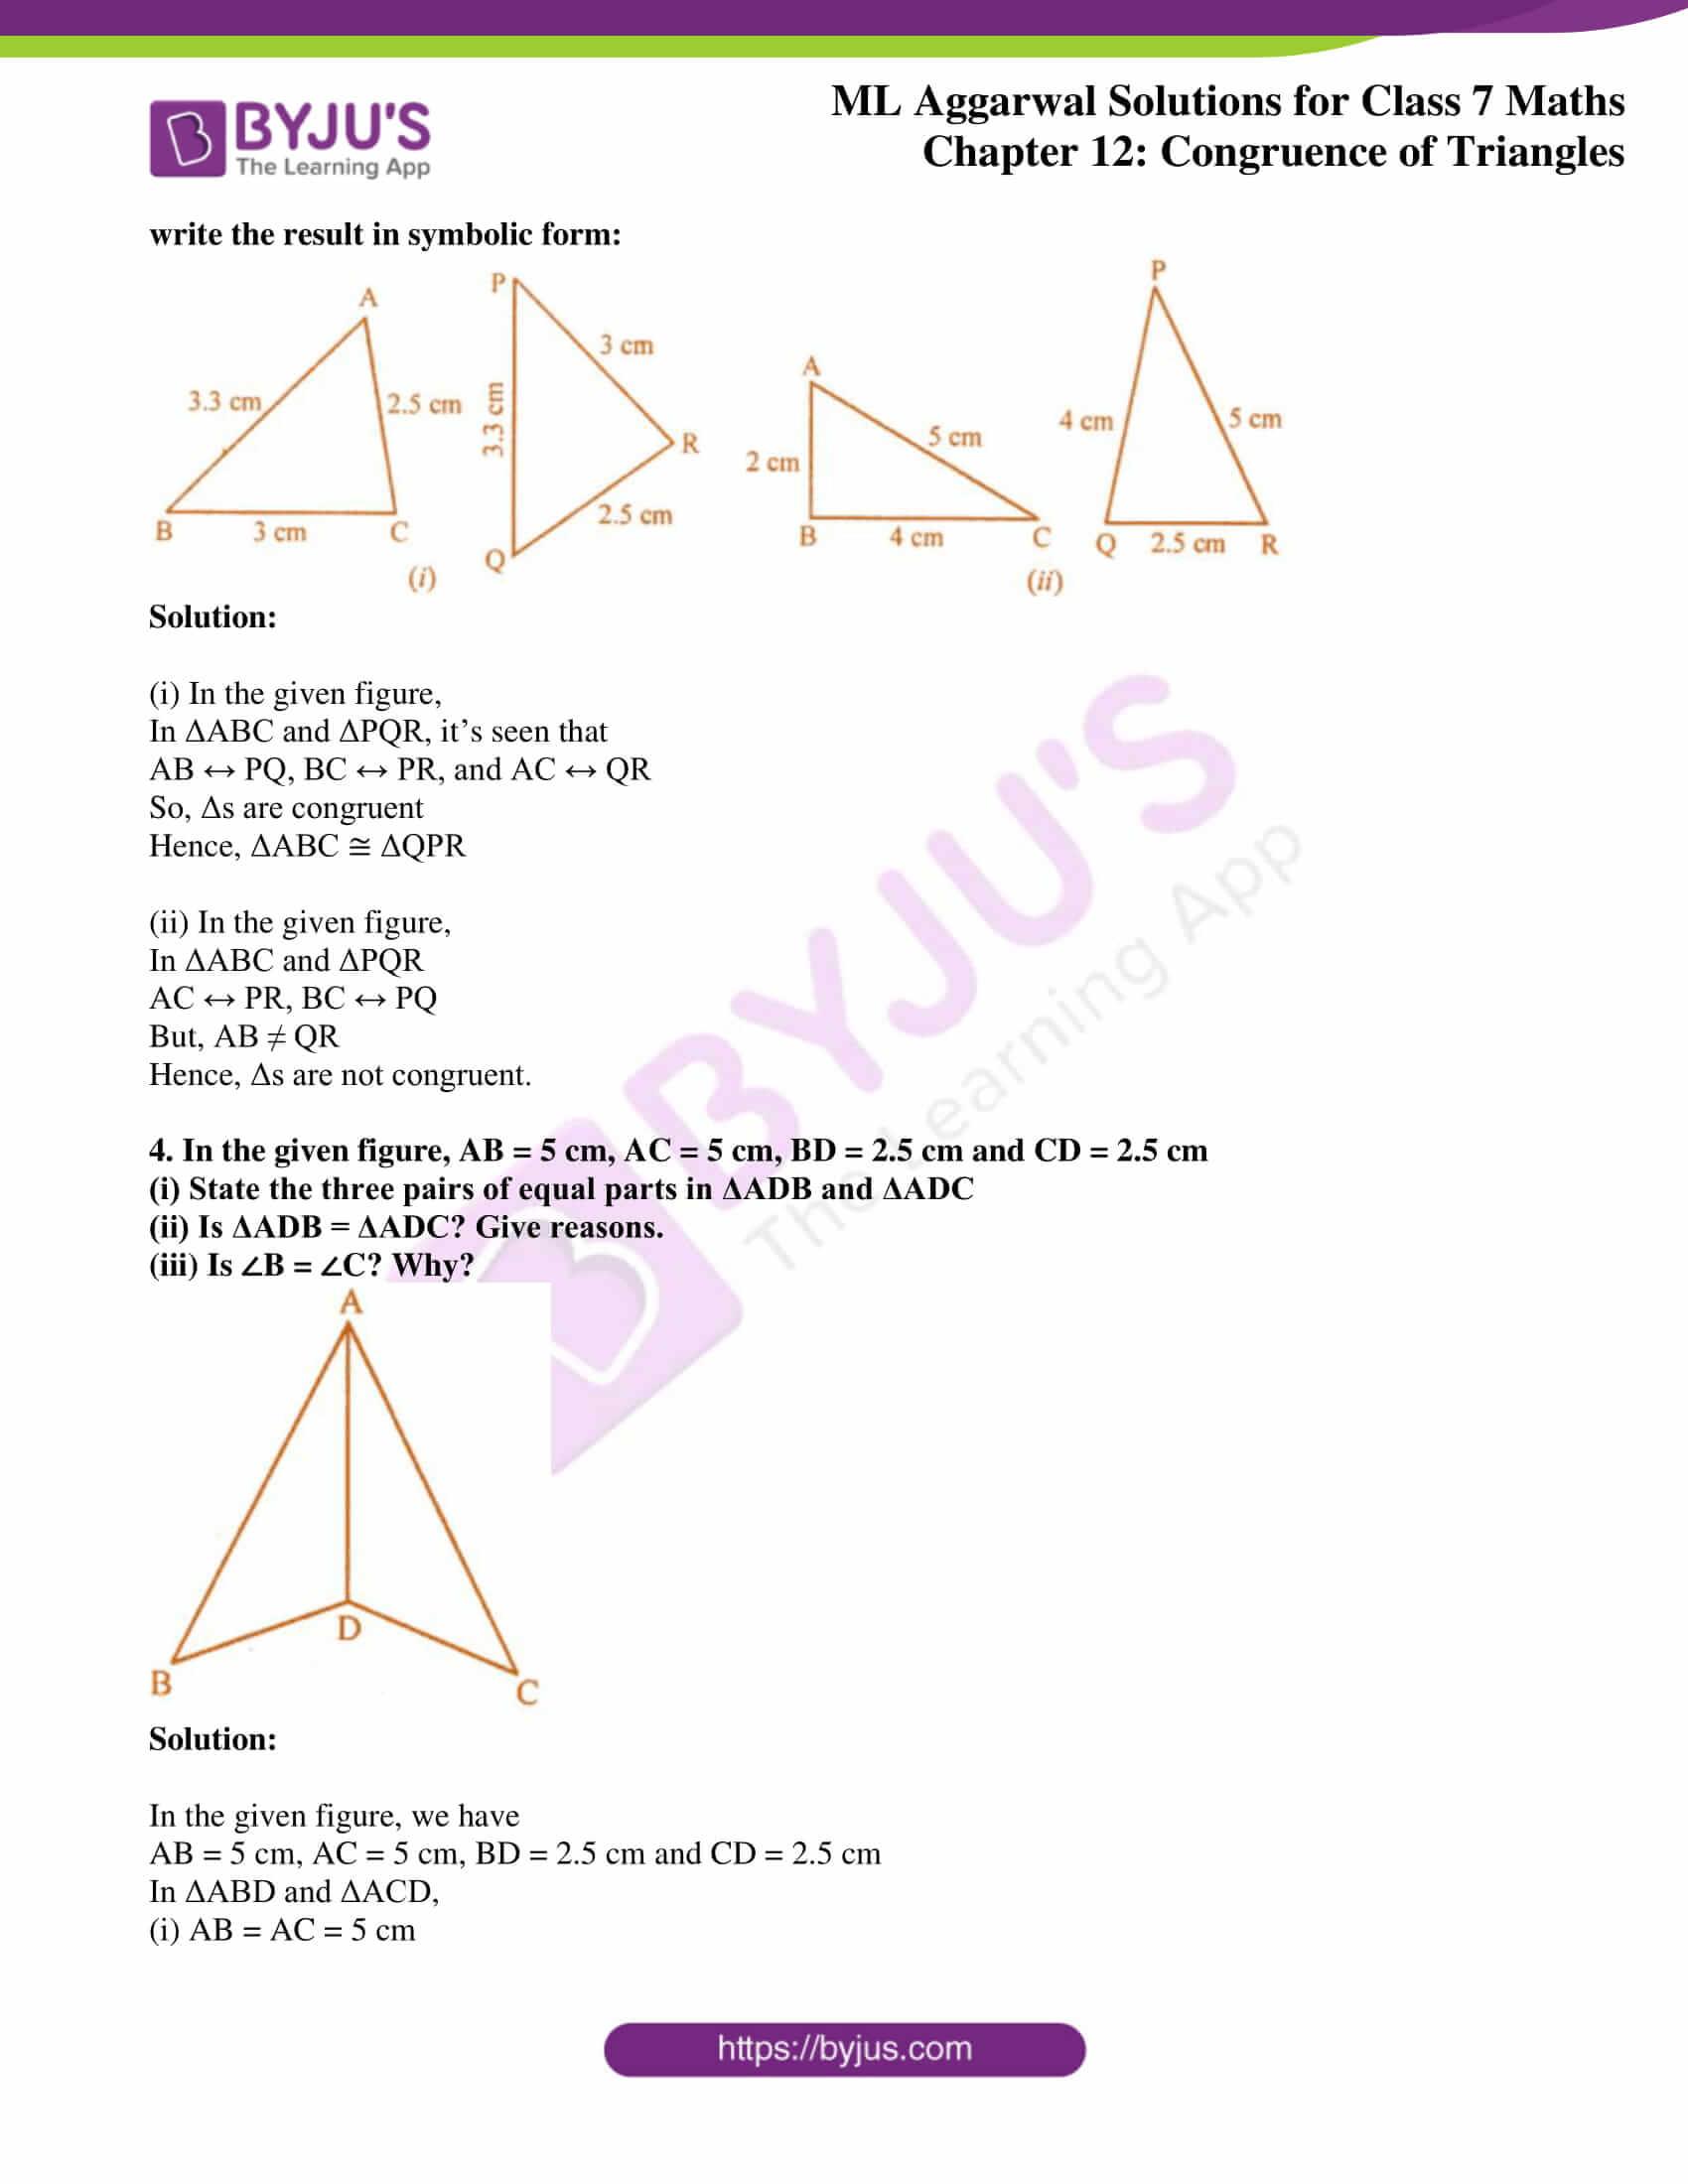 ml aggarwal sol class 7 maths chapter 12 2